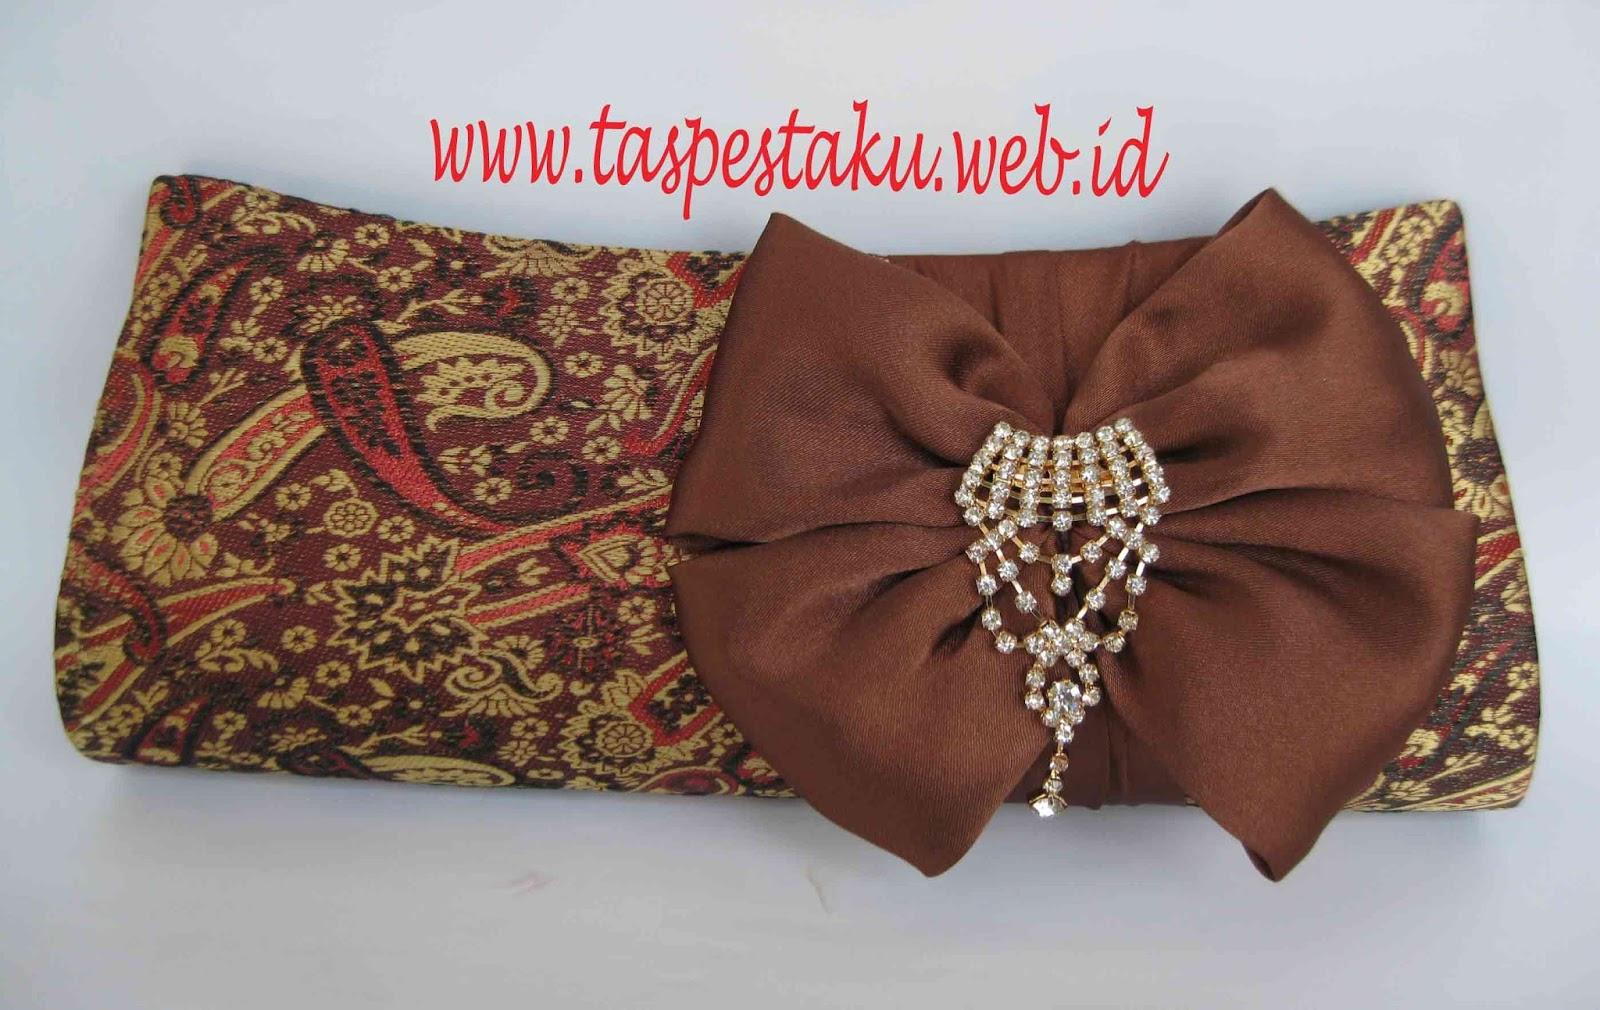 Clutch Bag Dompet Pesta KOleksi Tas Pesta Ku Warna Coklat Cantik dan  Elegant (Masih Bisa Dipesan) 18a9f04b9b